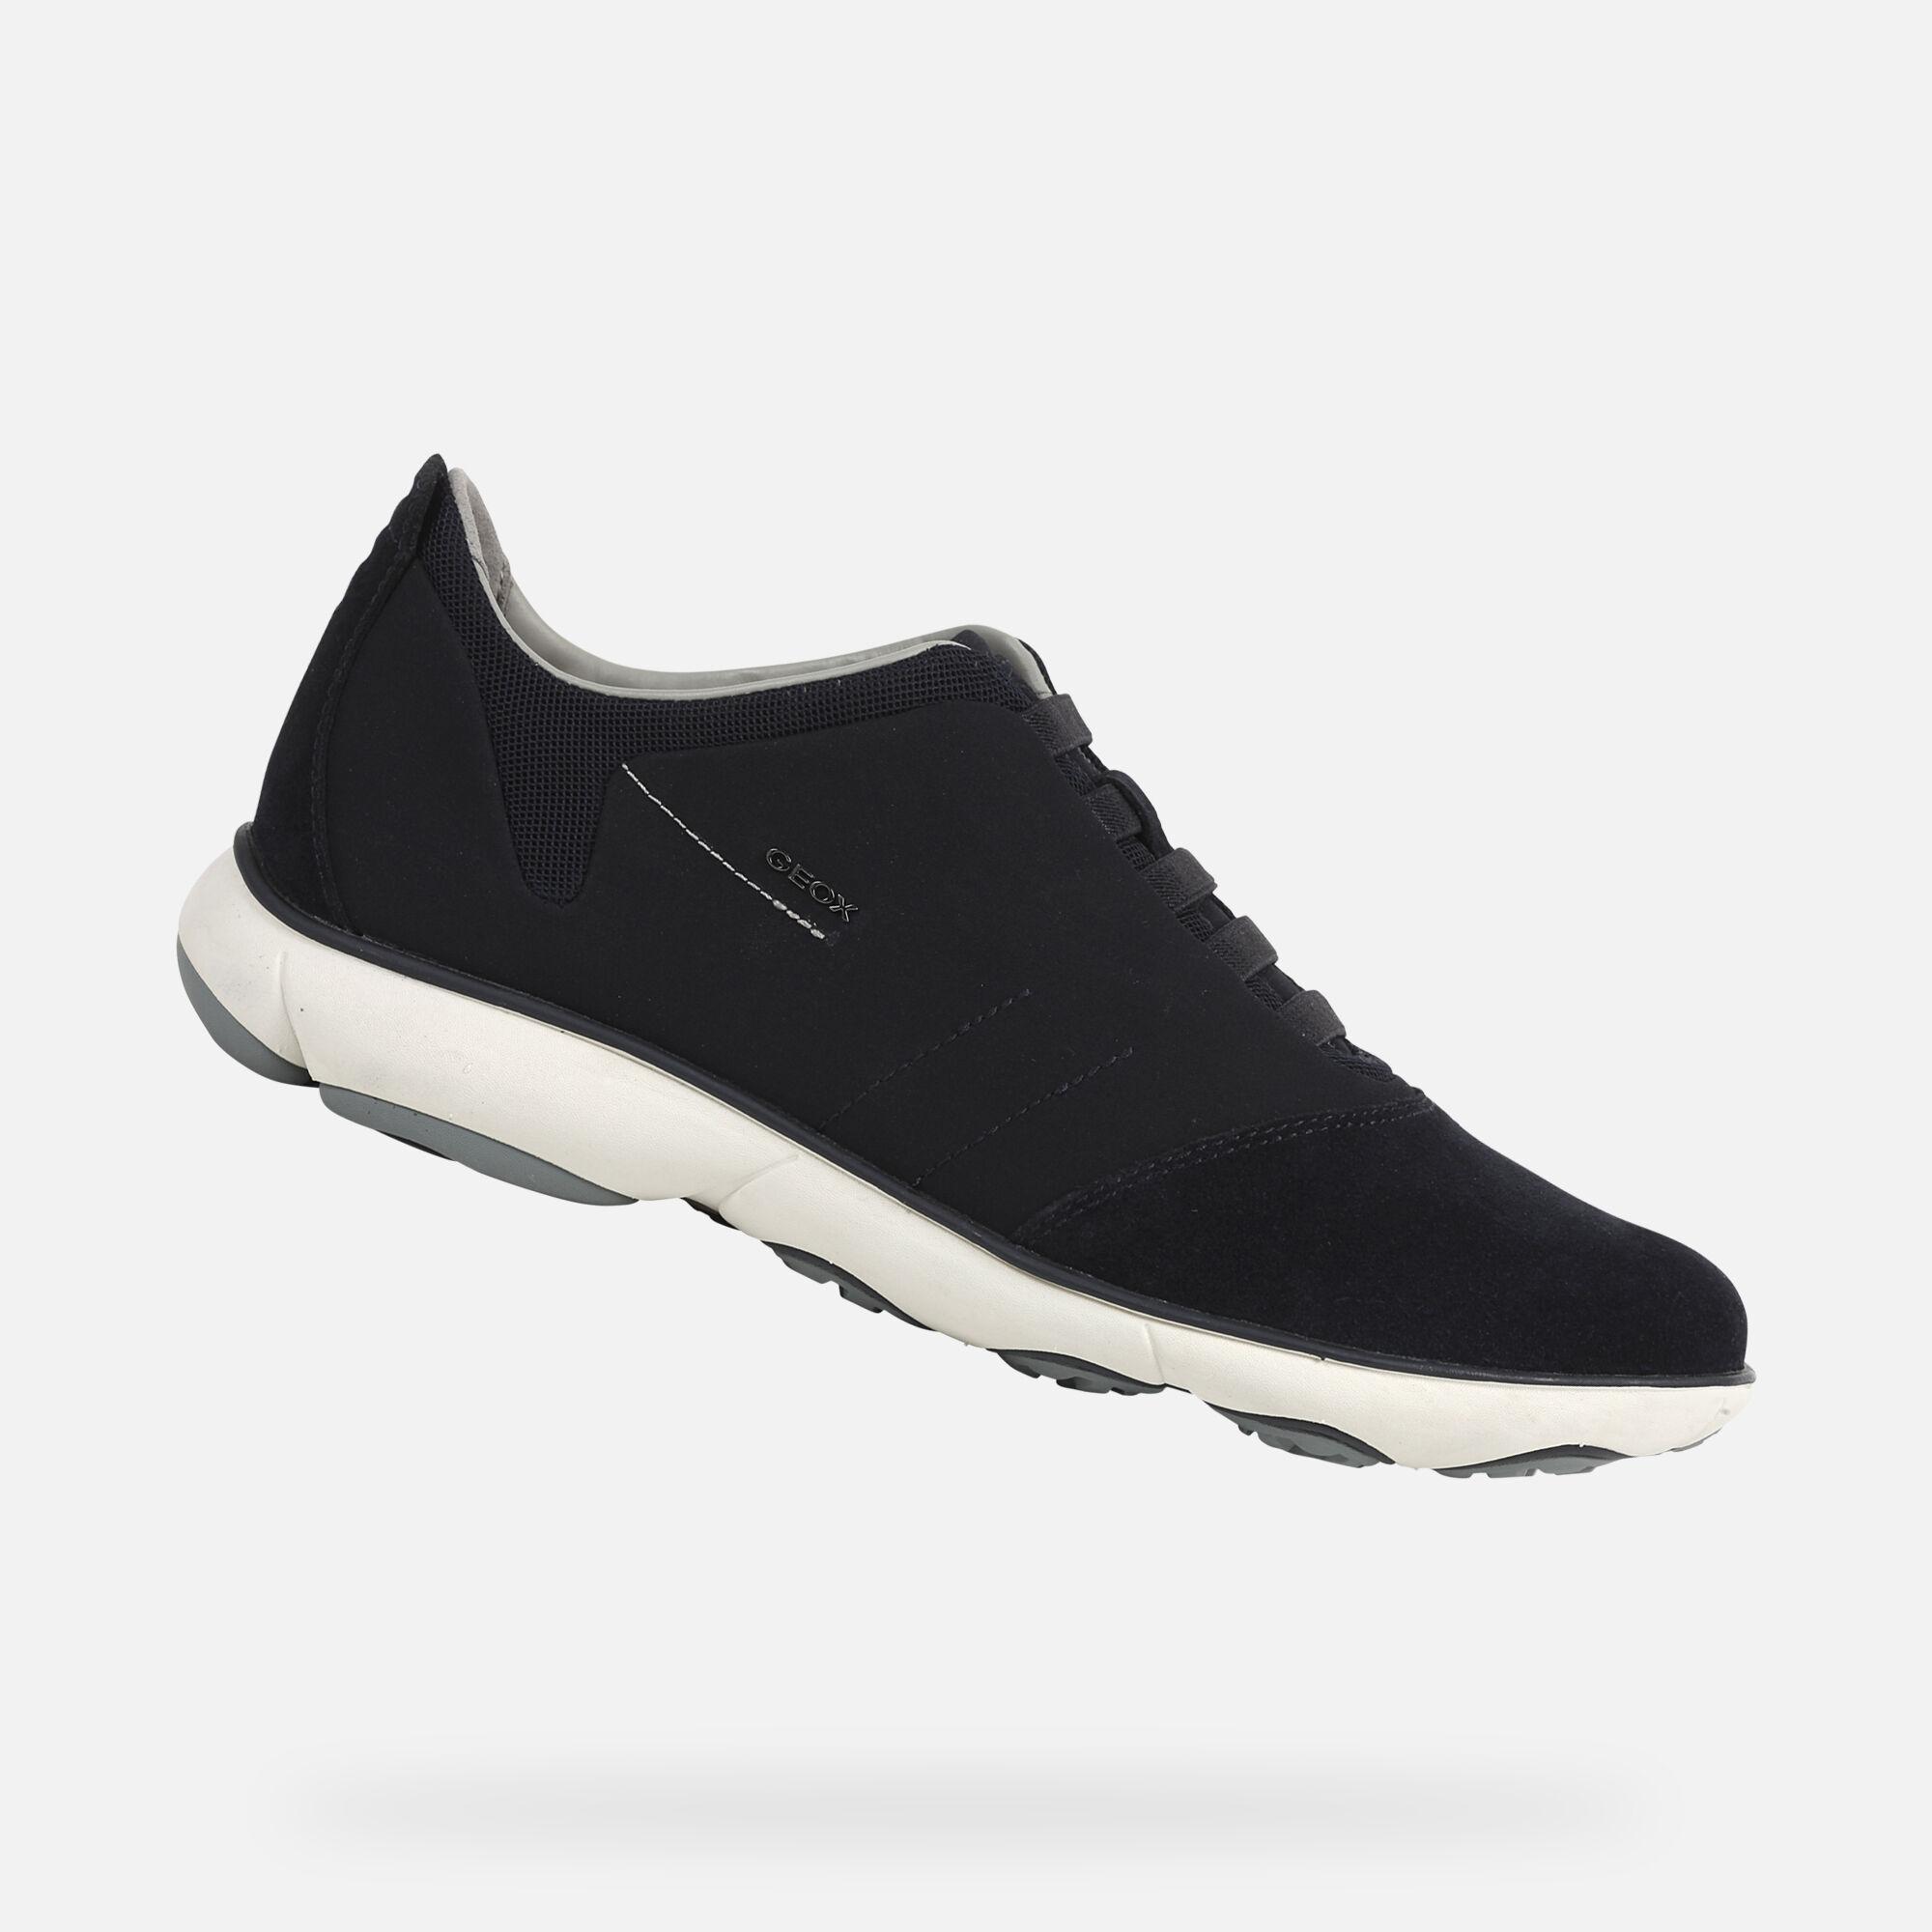 Sneakers Scarpe uomo Geox U AERANTIS Blu 11332272 | Consegna Gratuita